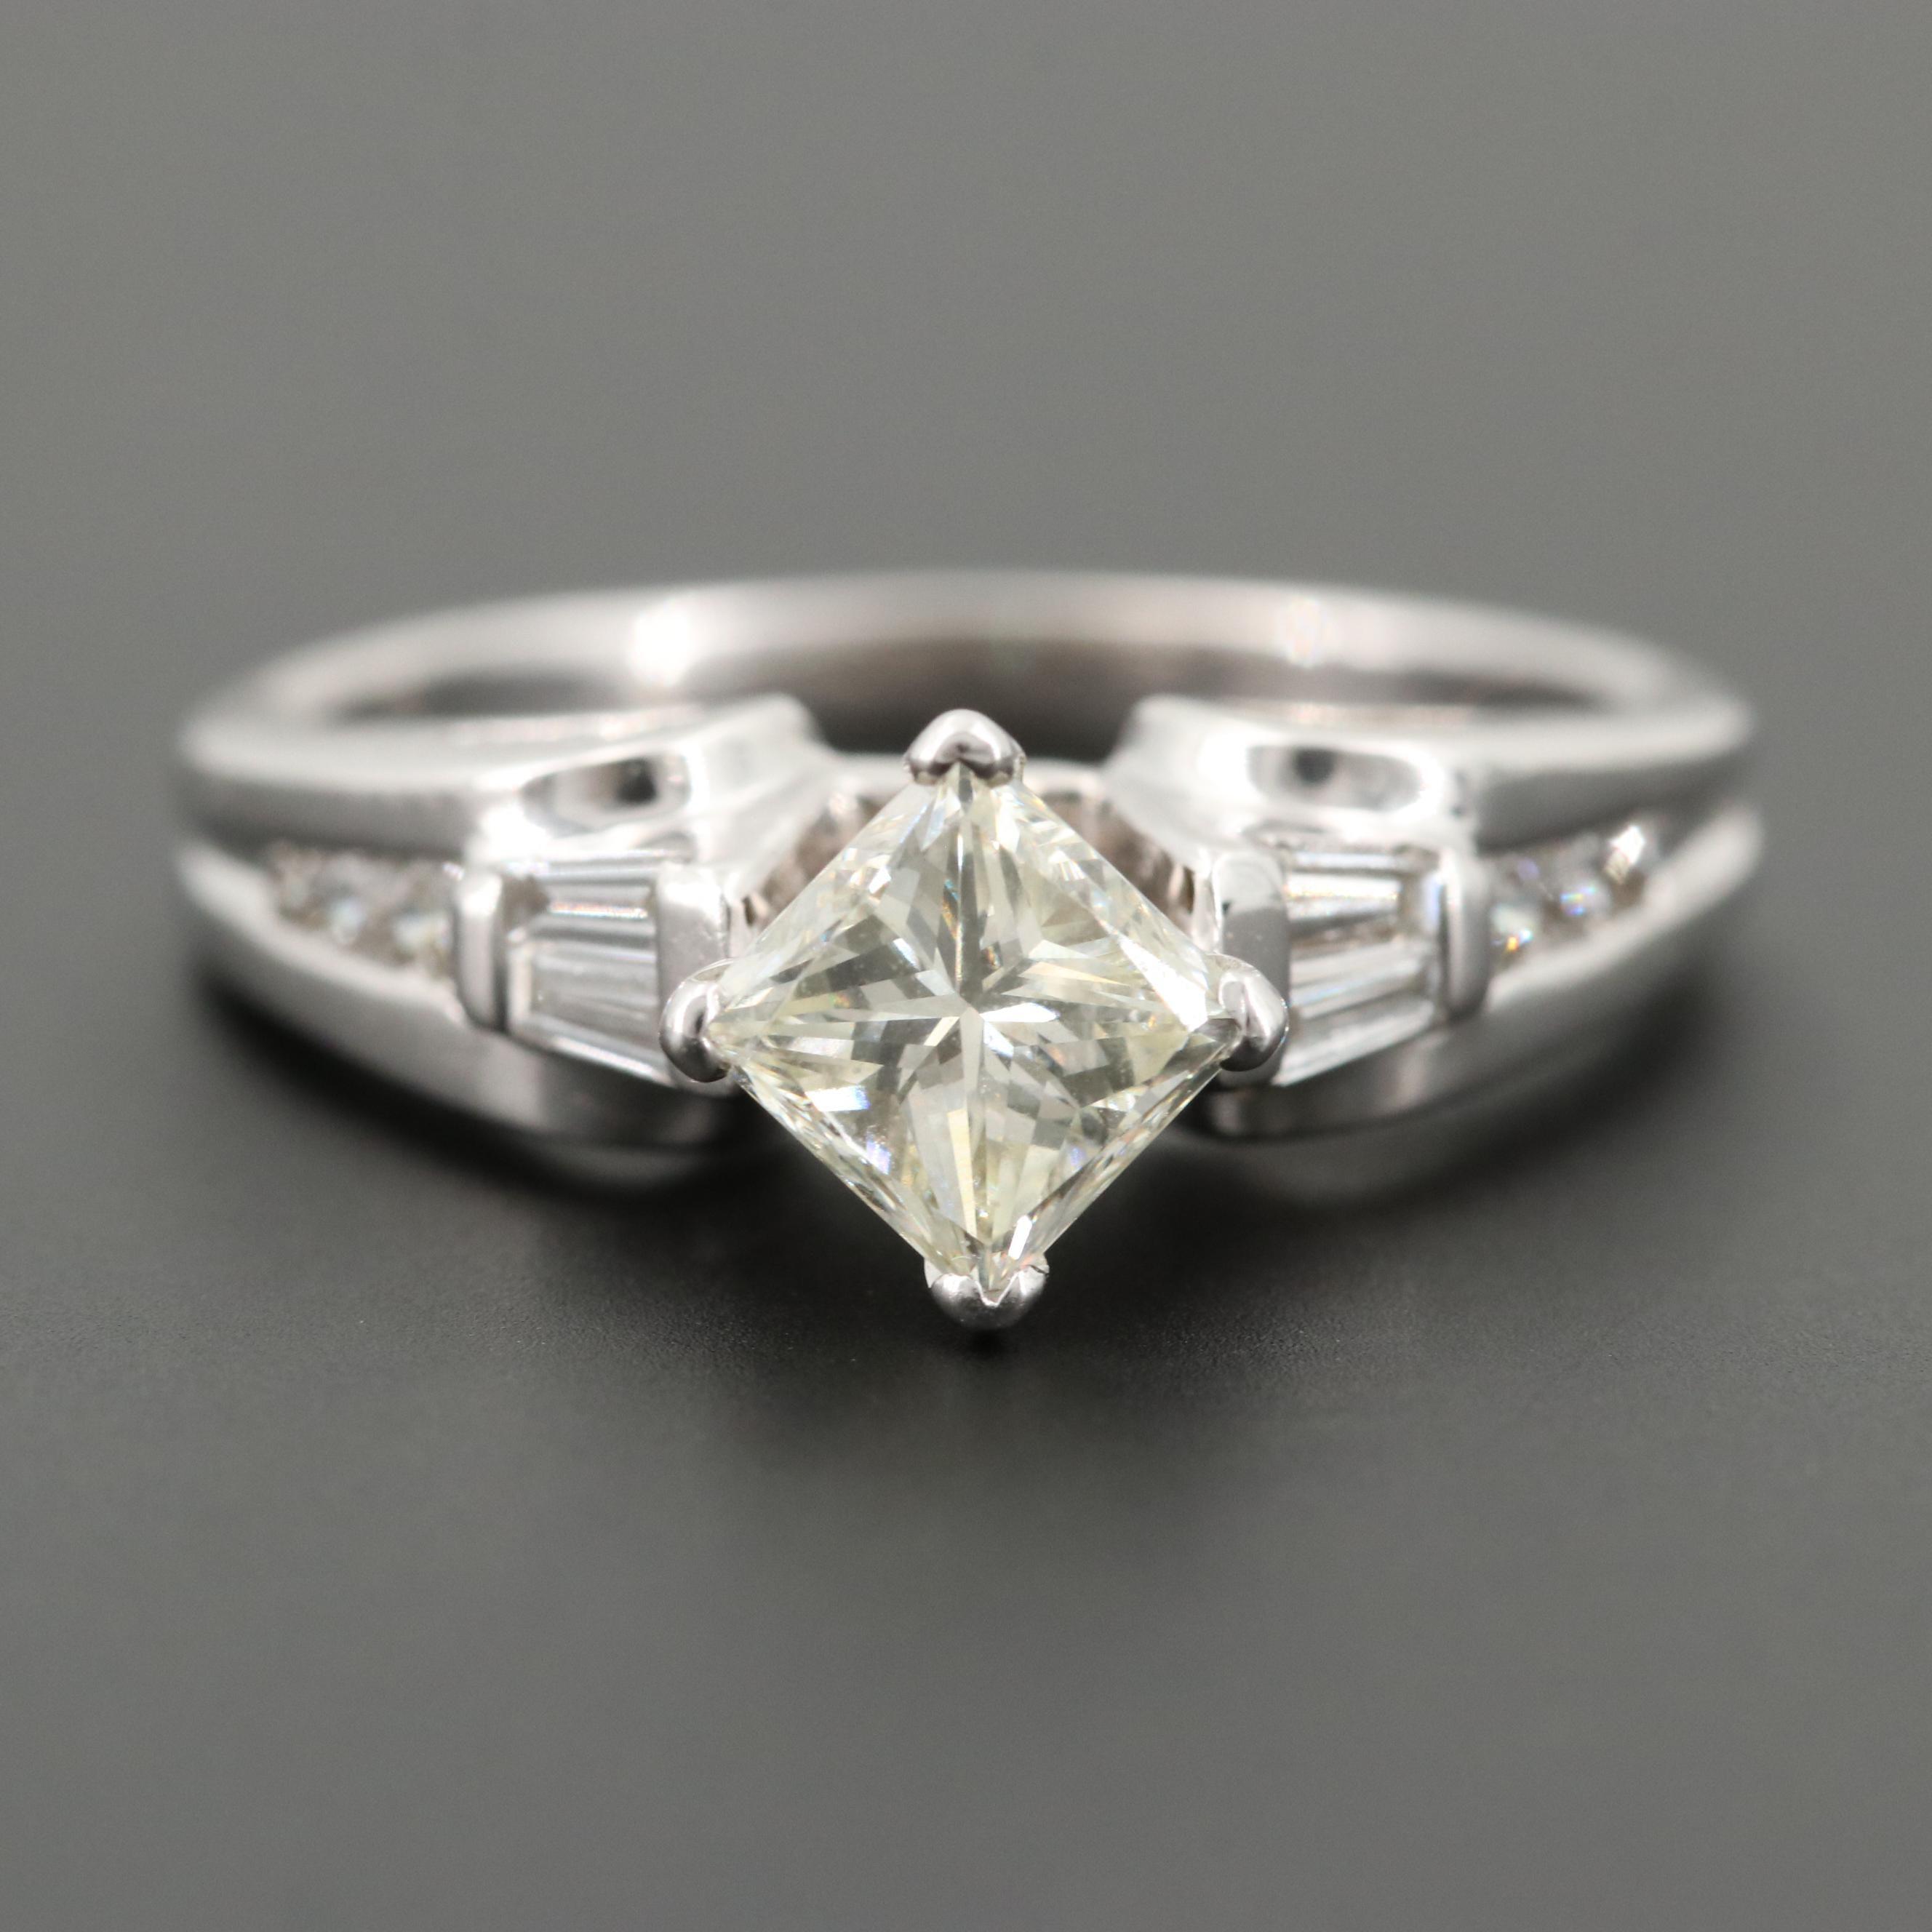 14K White Gold 1.07 CTW Diamond Ring